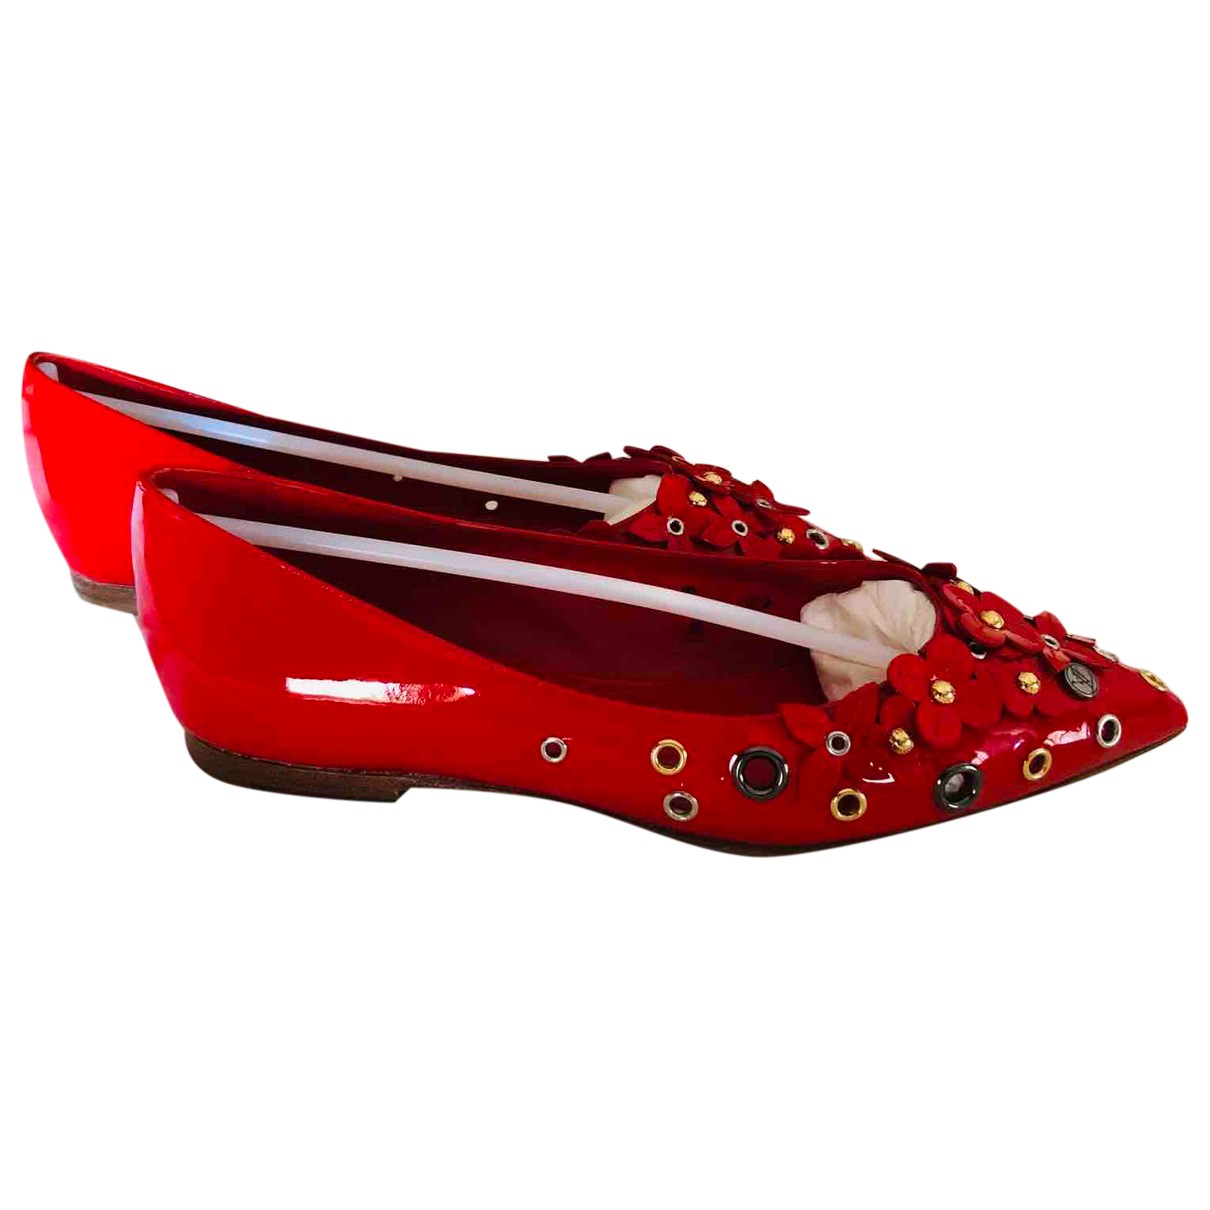 Bailarinas de Charol Louis Vuitton